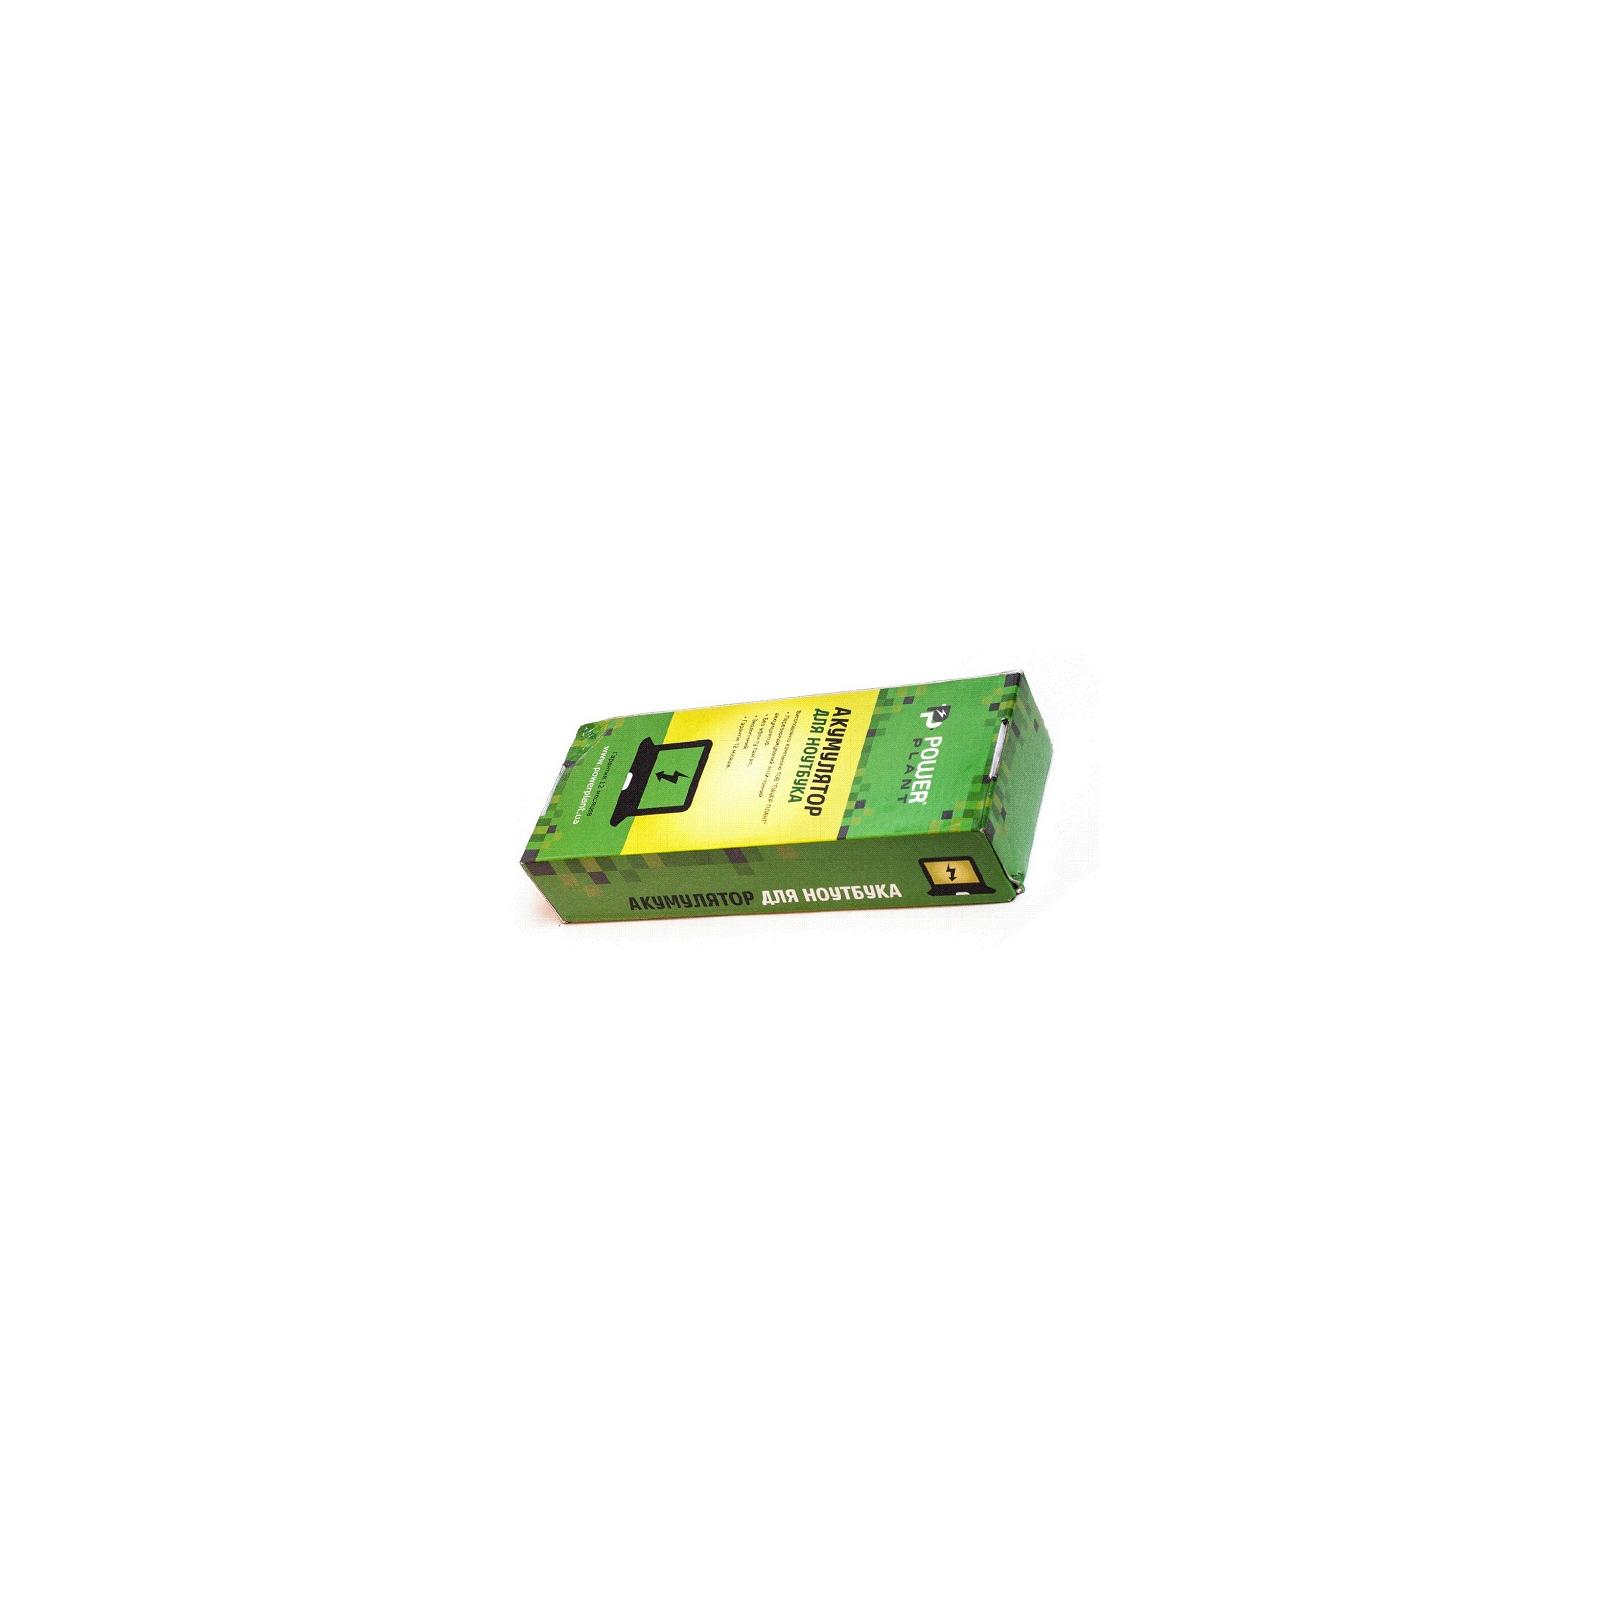 Аккумулятор для ноутбука DELL 1525 (RN873, DE 1525 3S2P) 11.1V 5200mAh PowerPlant (NB00000021) изображение 3